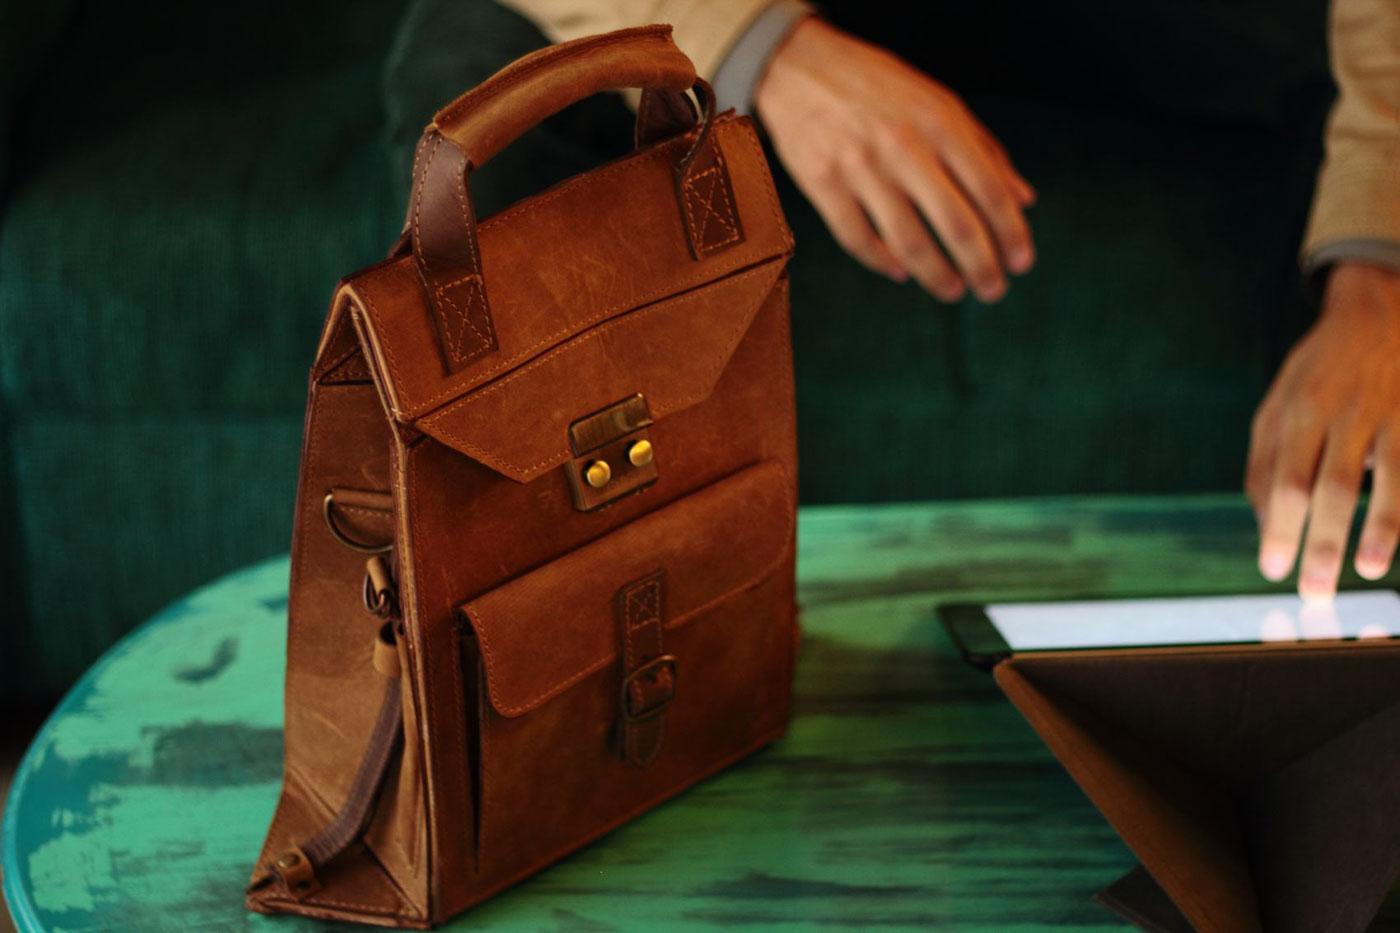 leather piel adolfo navarro pliego lo esencial Mexican Design leather goods bag backpack Guadalajara mexico